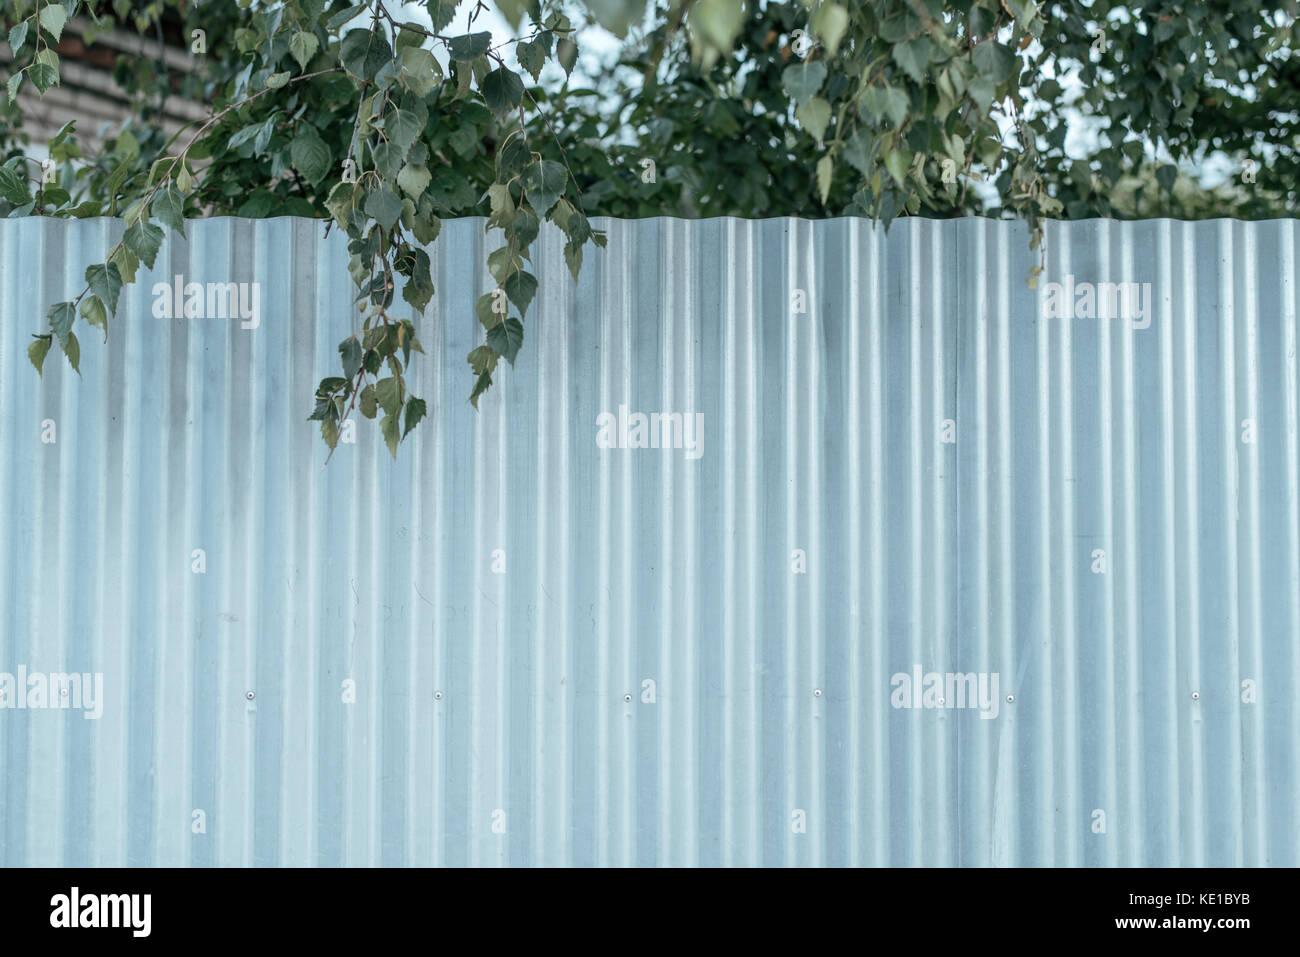 Silver Metal Fence Stockfotos & Silver Metal Fence Bilder - Alamy